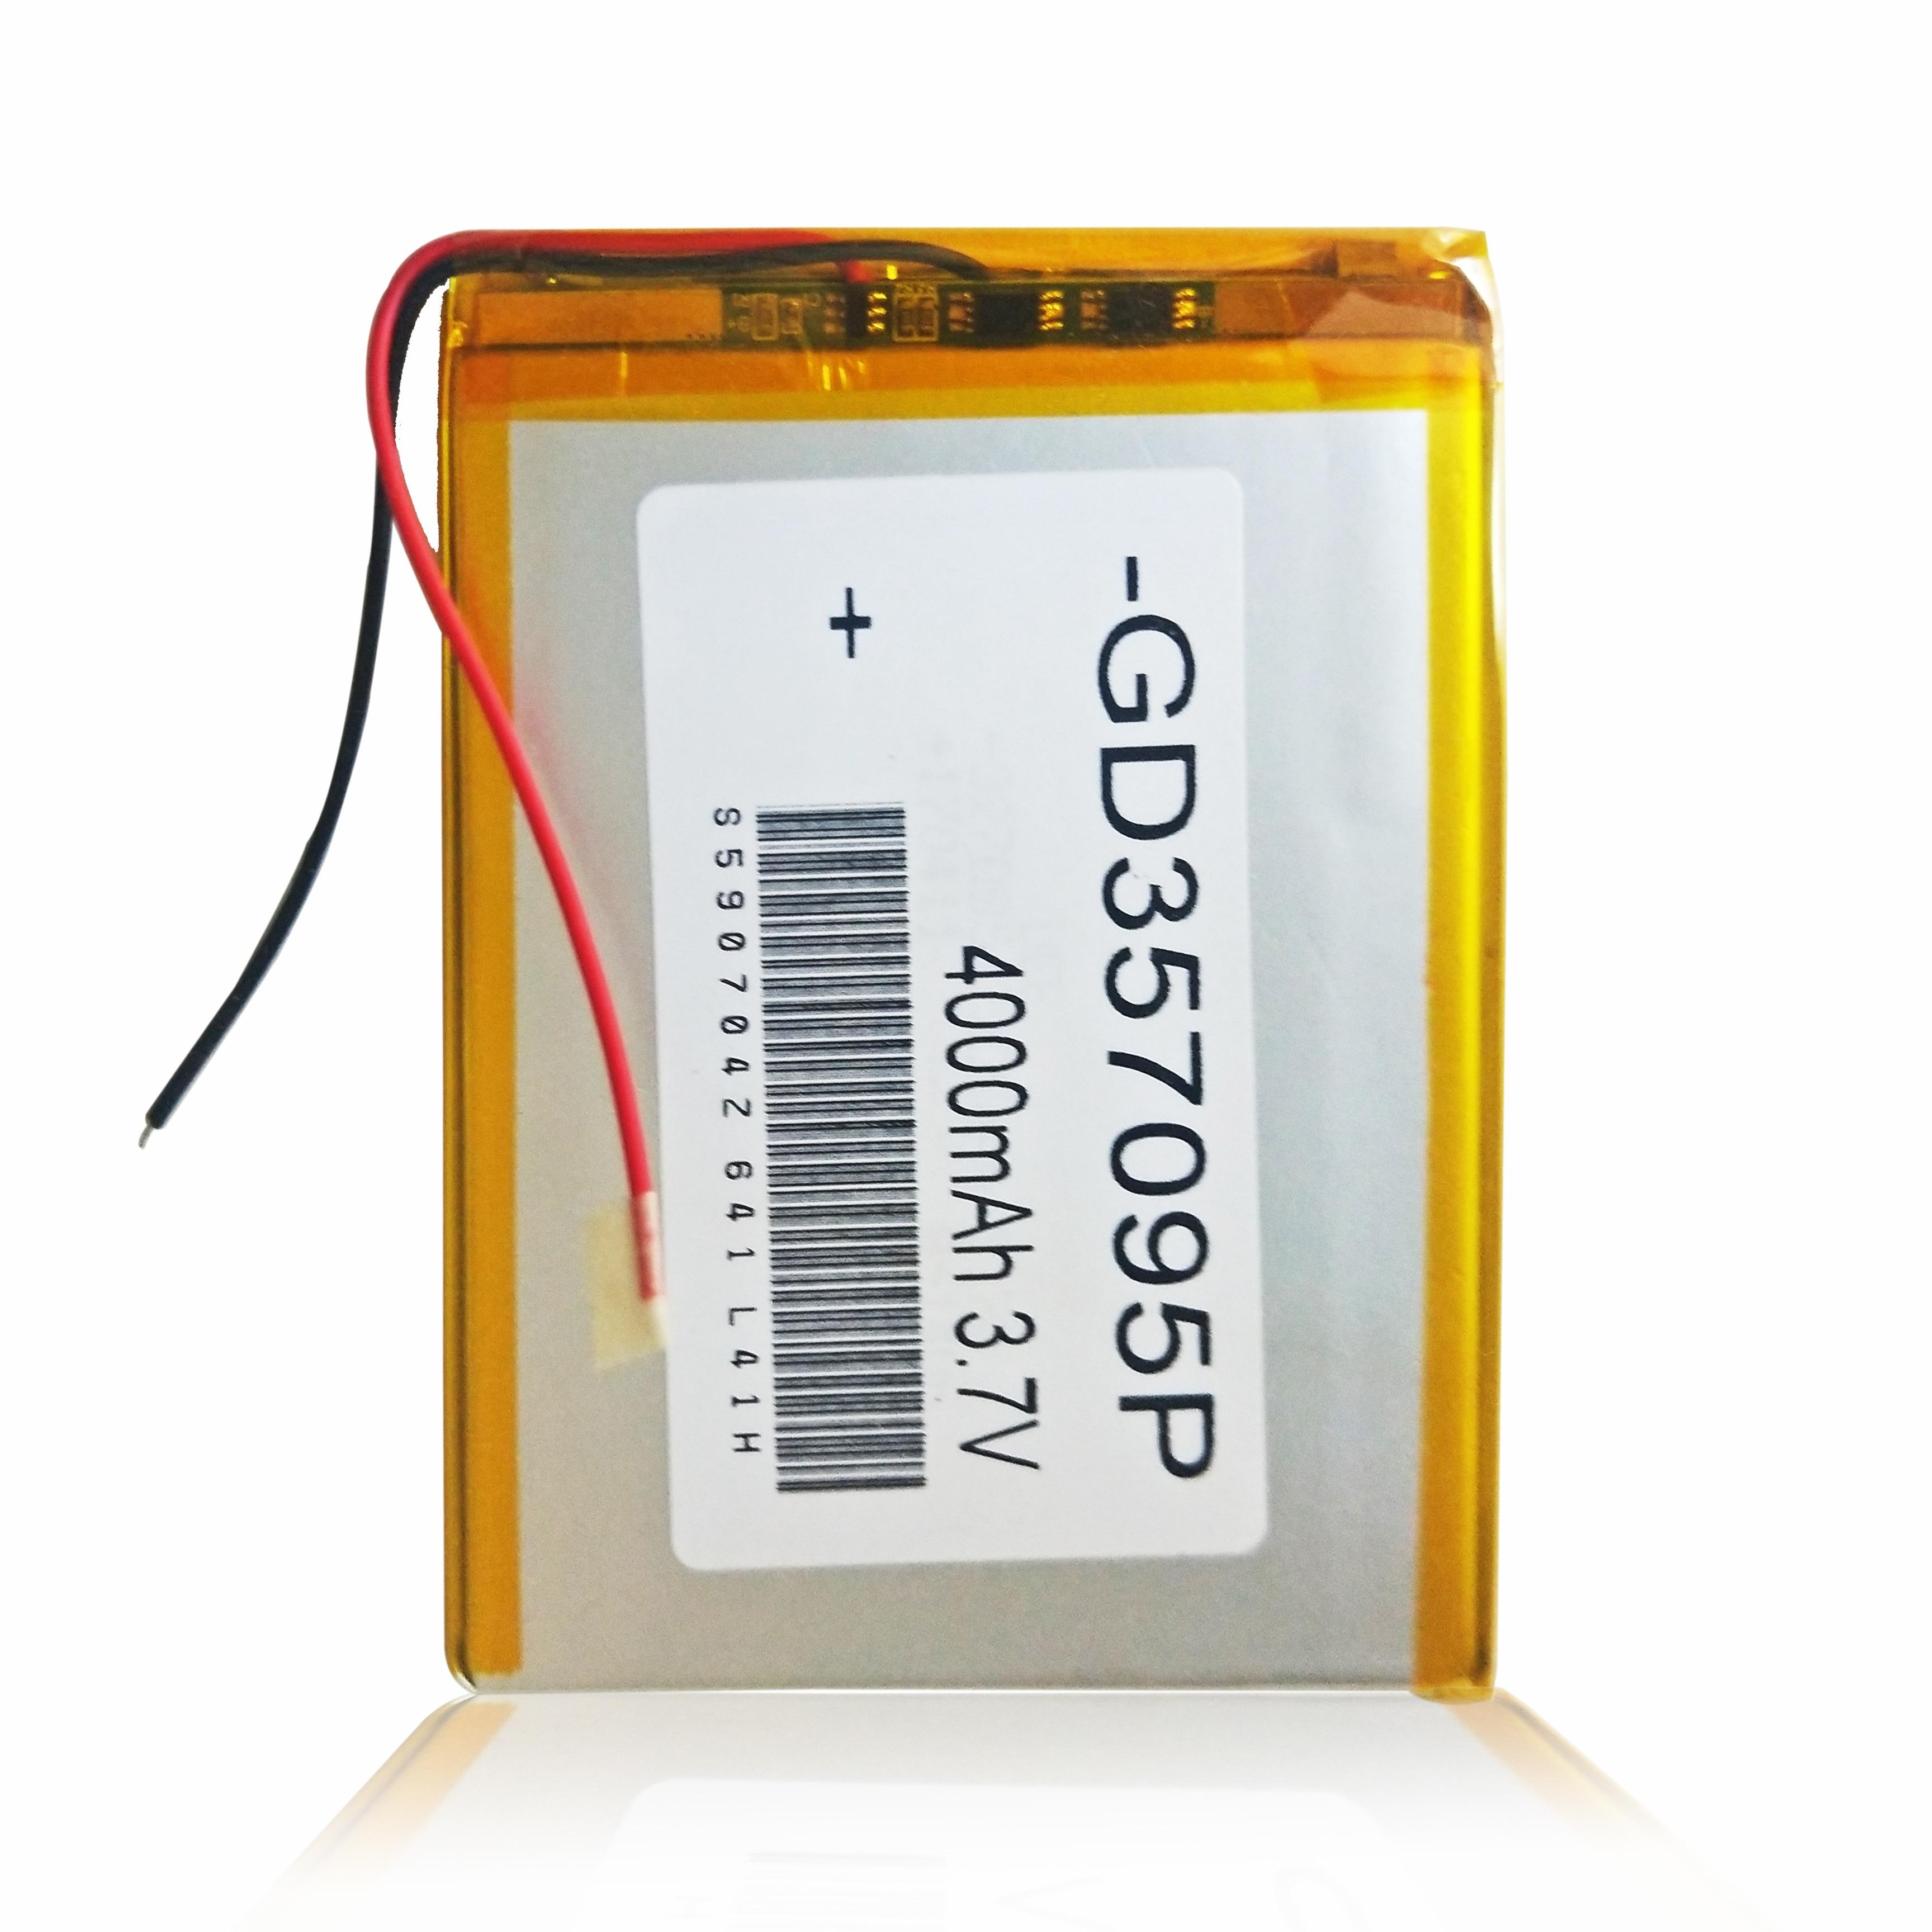 357090 3,7 V 4000mAh литий-полимерный литий-ионный аккумулятор для Digma Plane 7557 4G PS7171PL 7700B 4G PS7009ML S7.0 3g PS7005MG